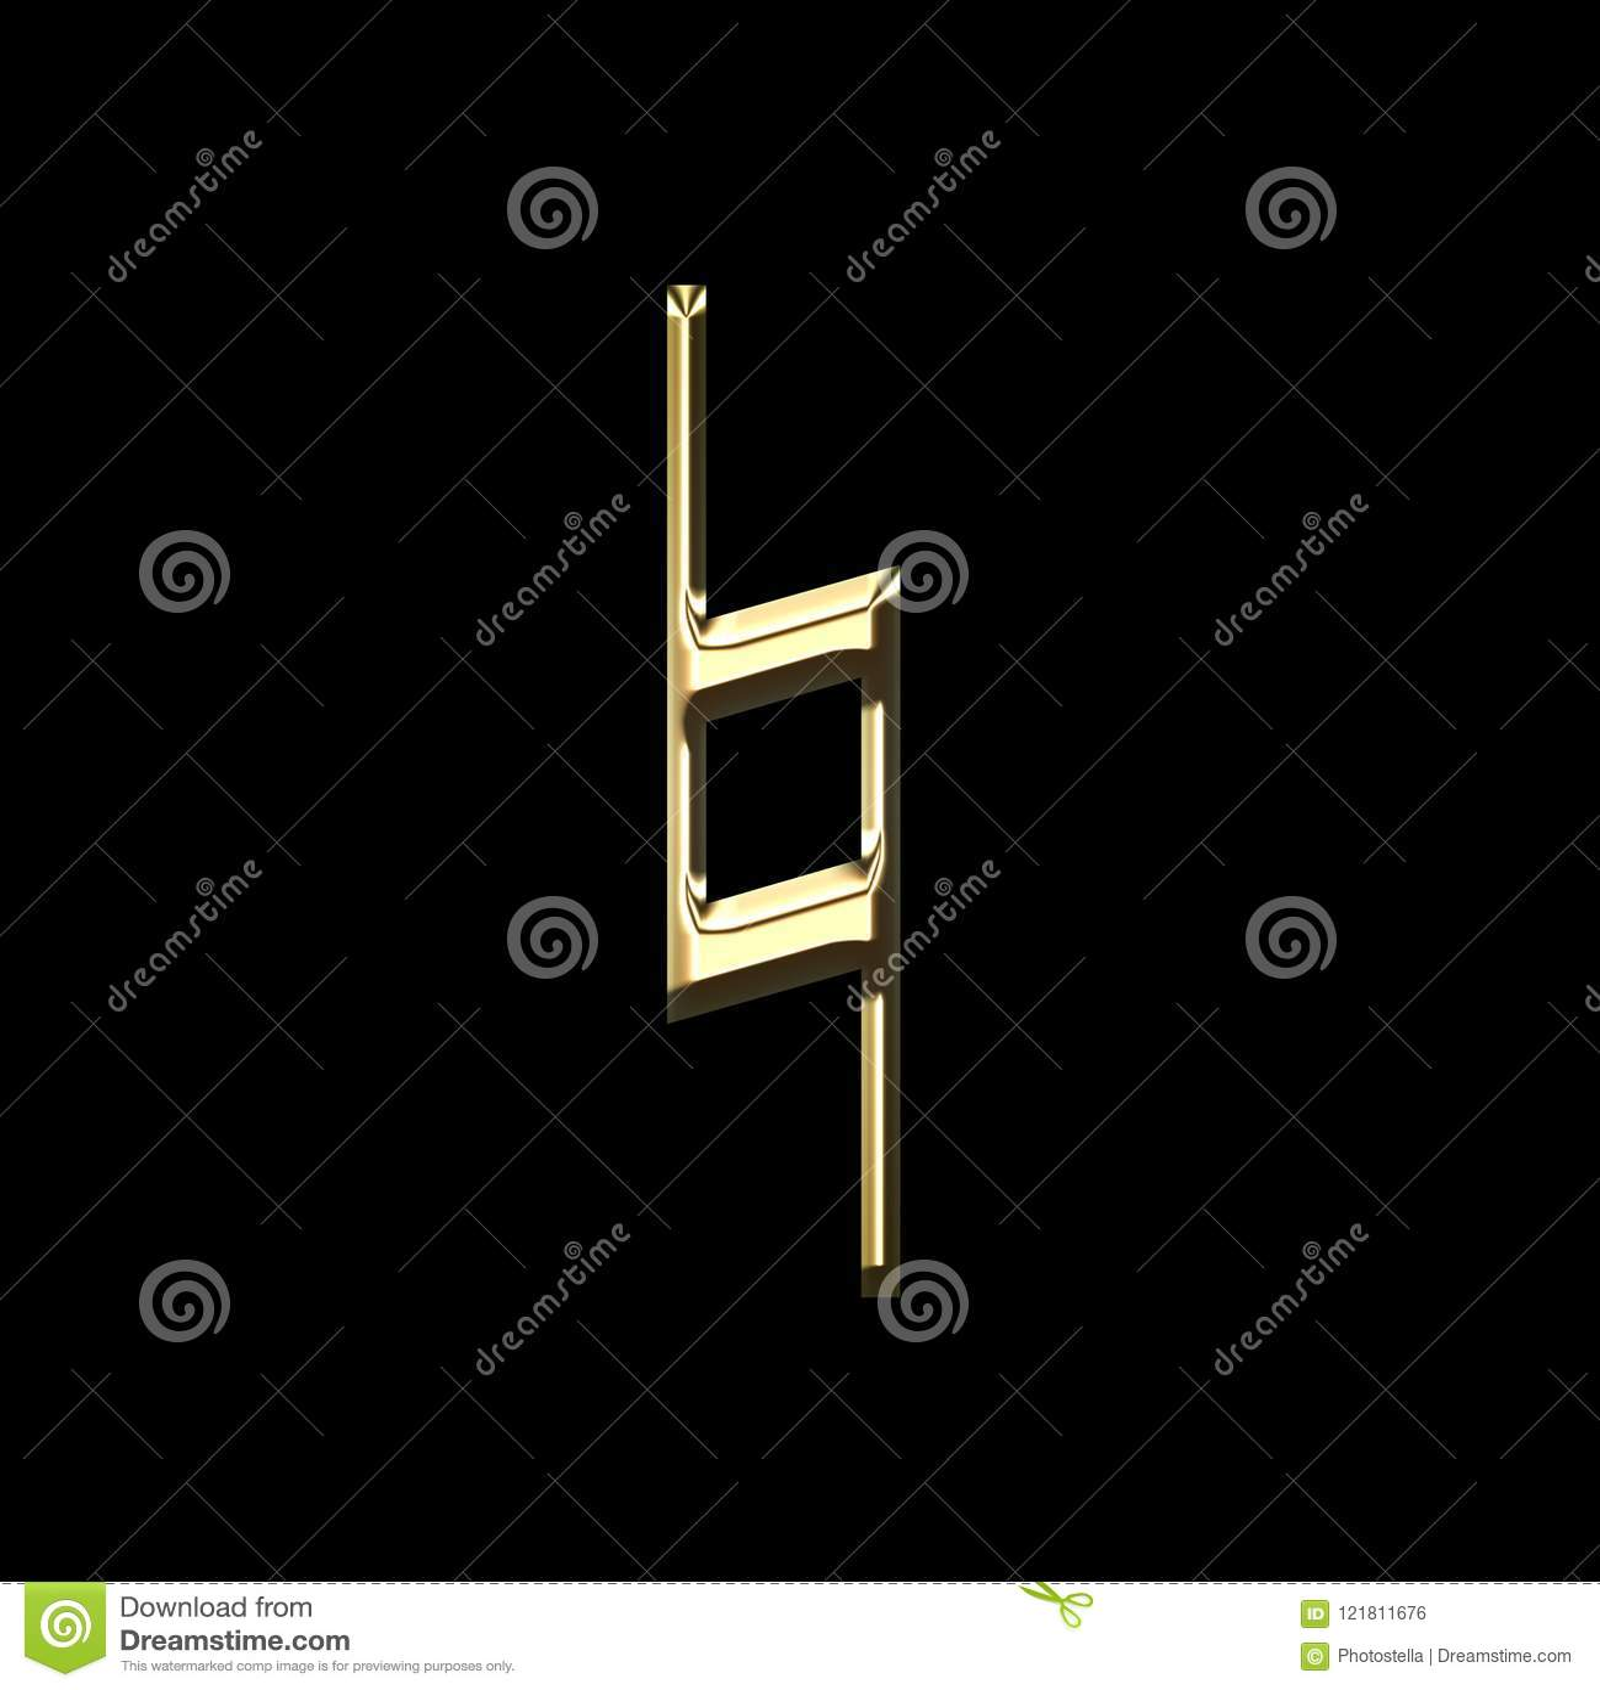 Golden Music Natural Sign Musical Symbol Illustration Stock